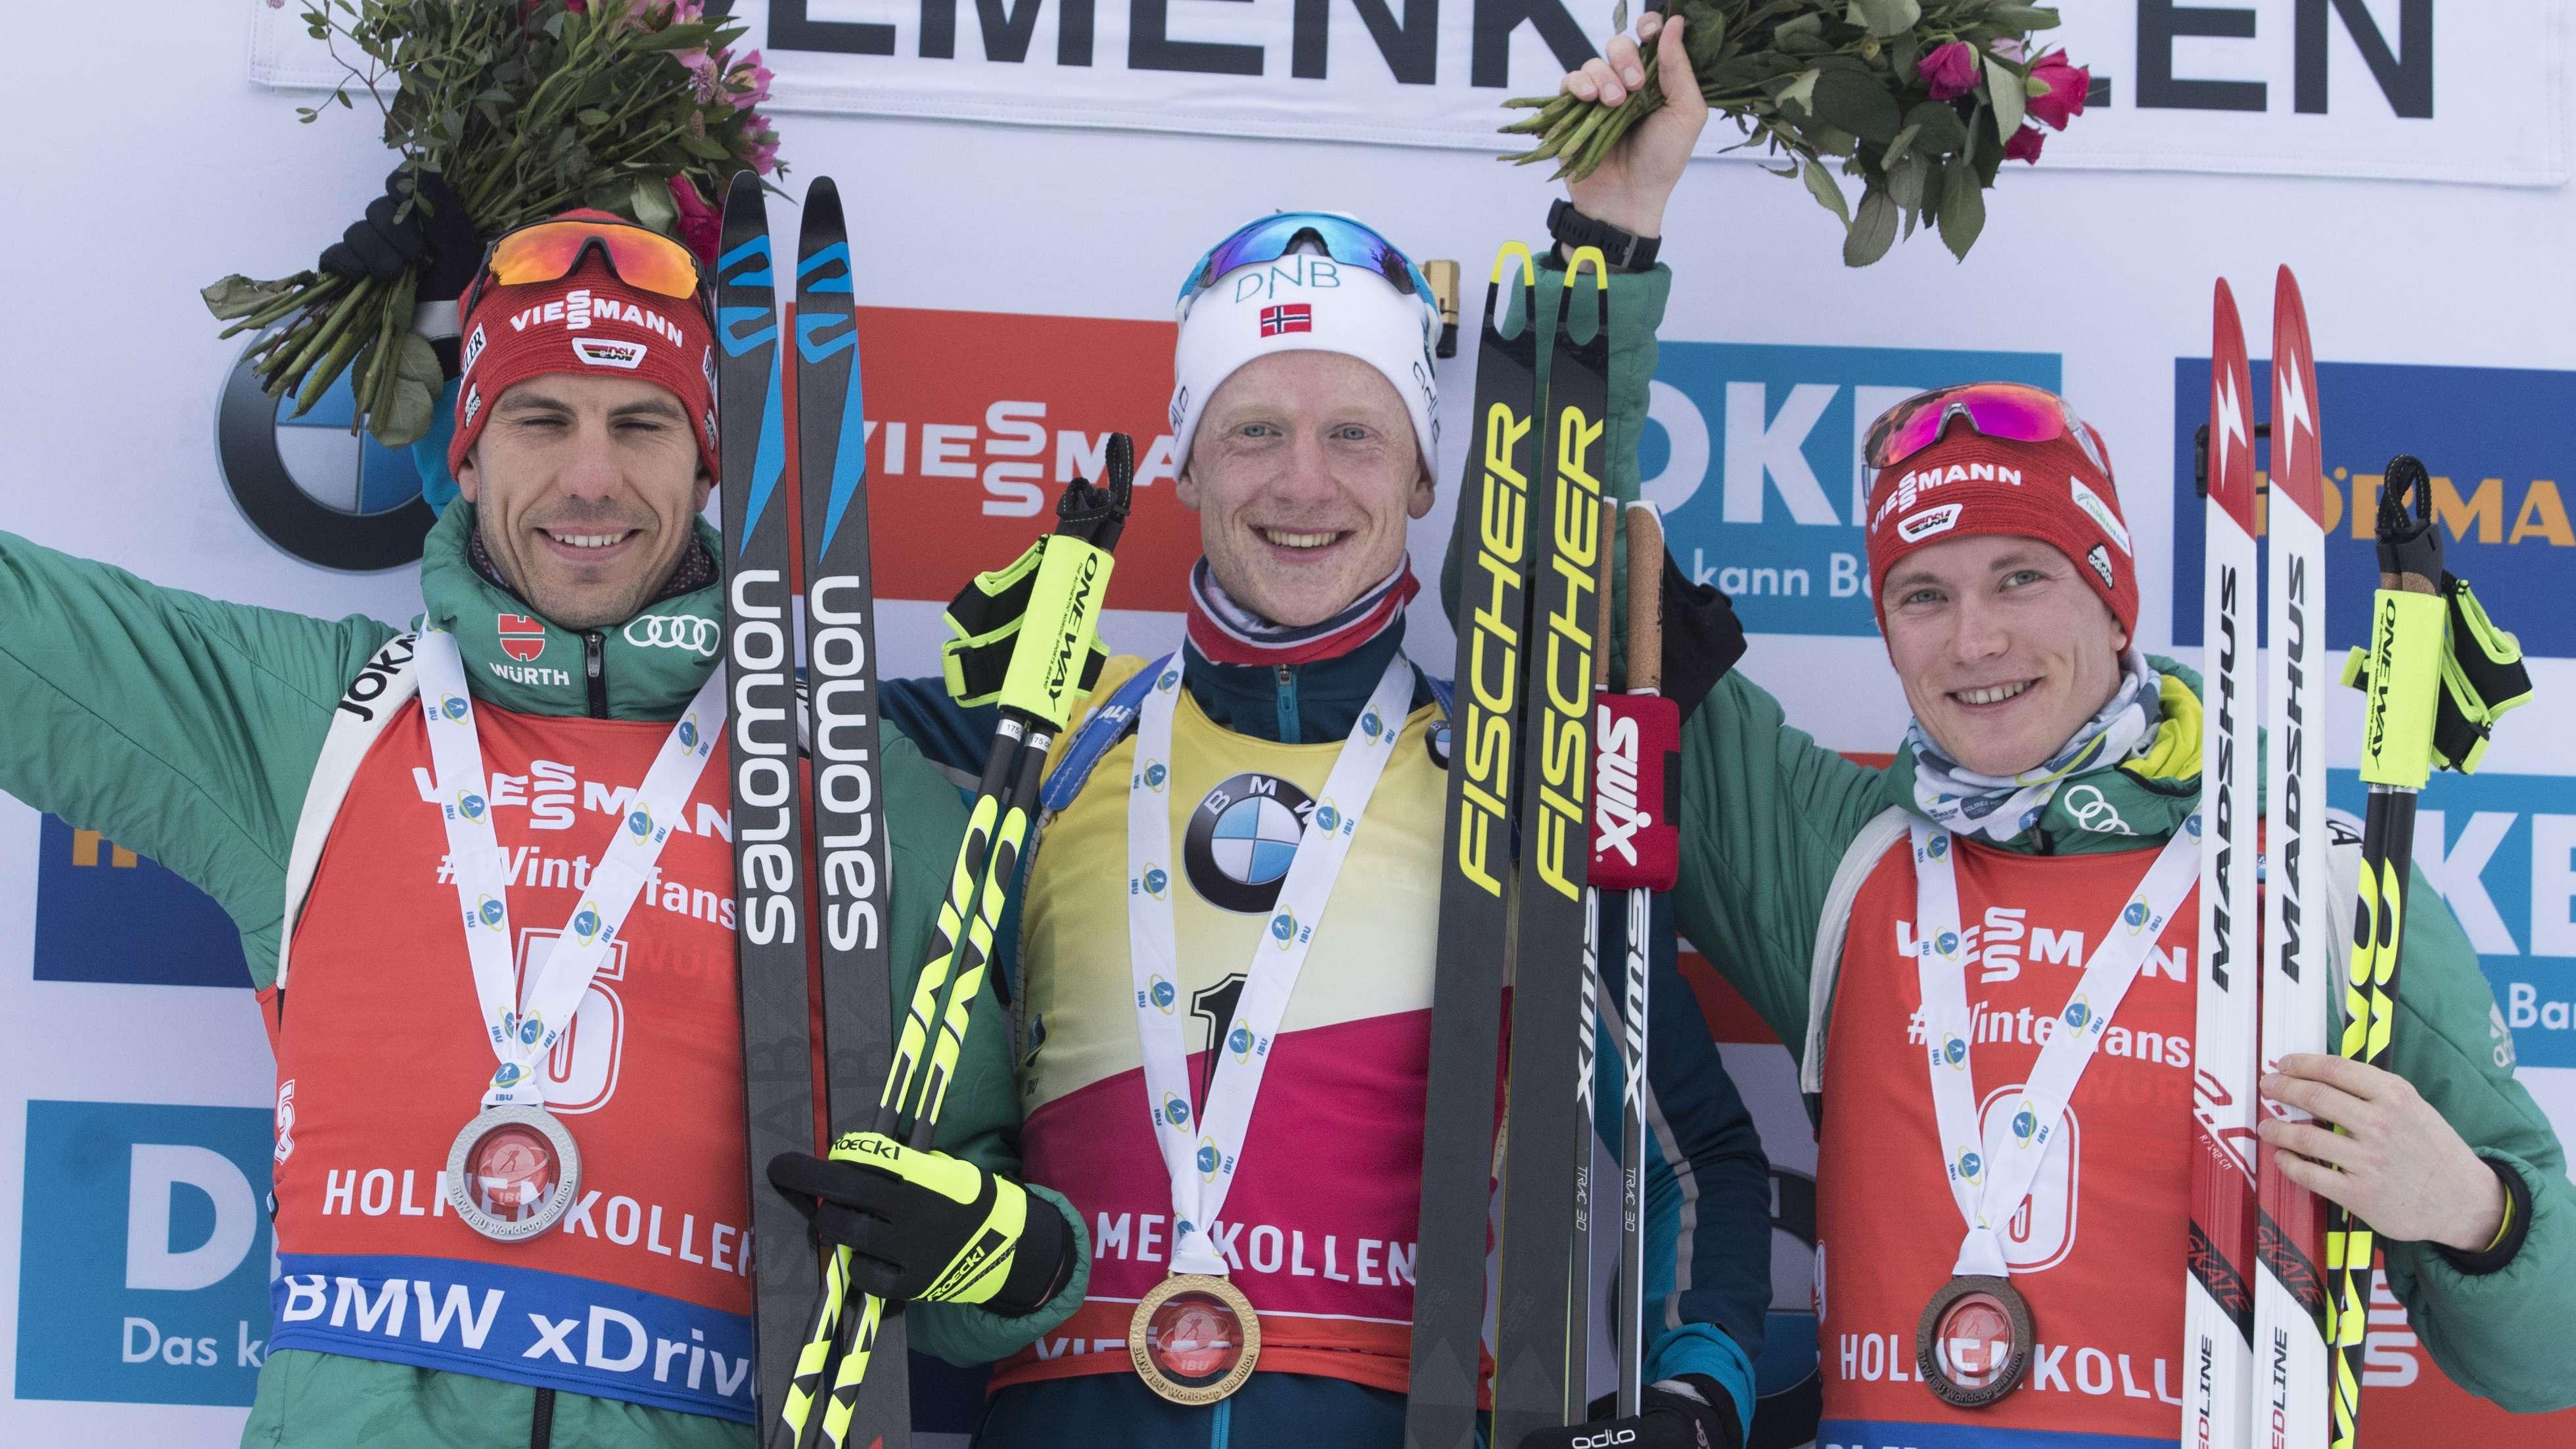 Podest Biathlon-Massenstart Oslo (v.l.): Arnd Peiffer, Johannes Thingnes Bö, Benedikt Doll